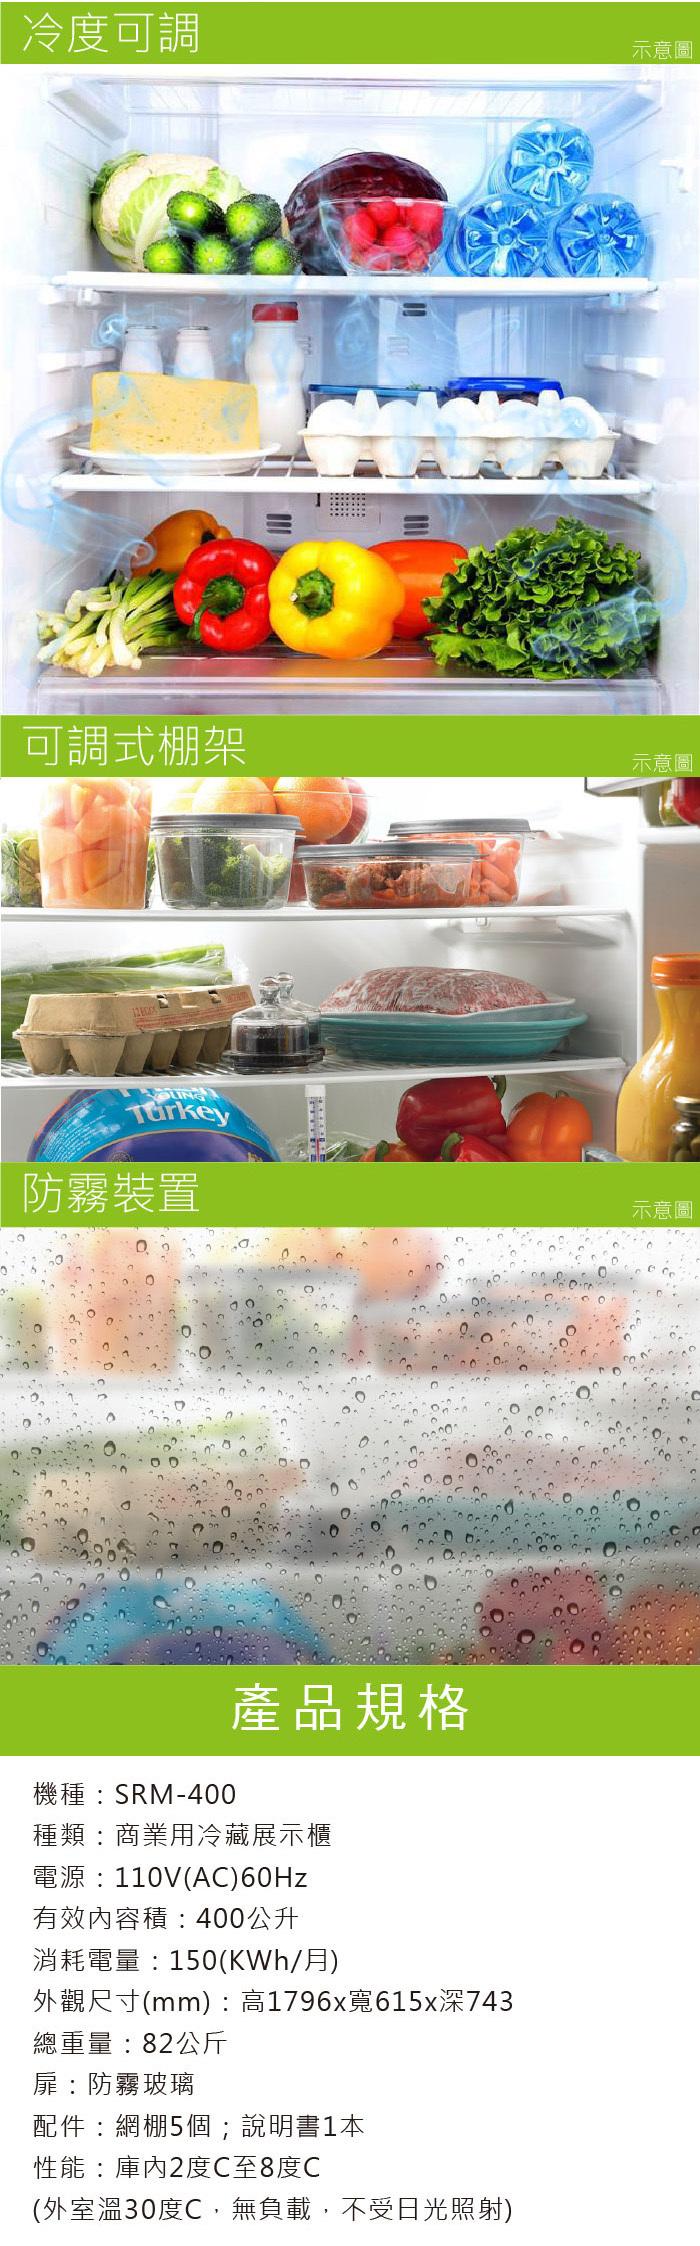 SANLUX 台灣三洋 SRM-400 冷凍櫃 400L 自動循環系統 不結冰球